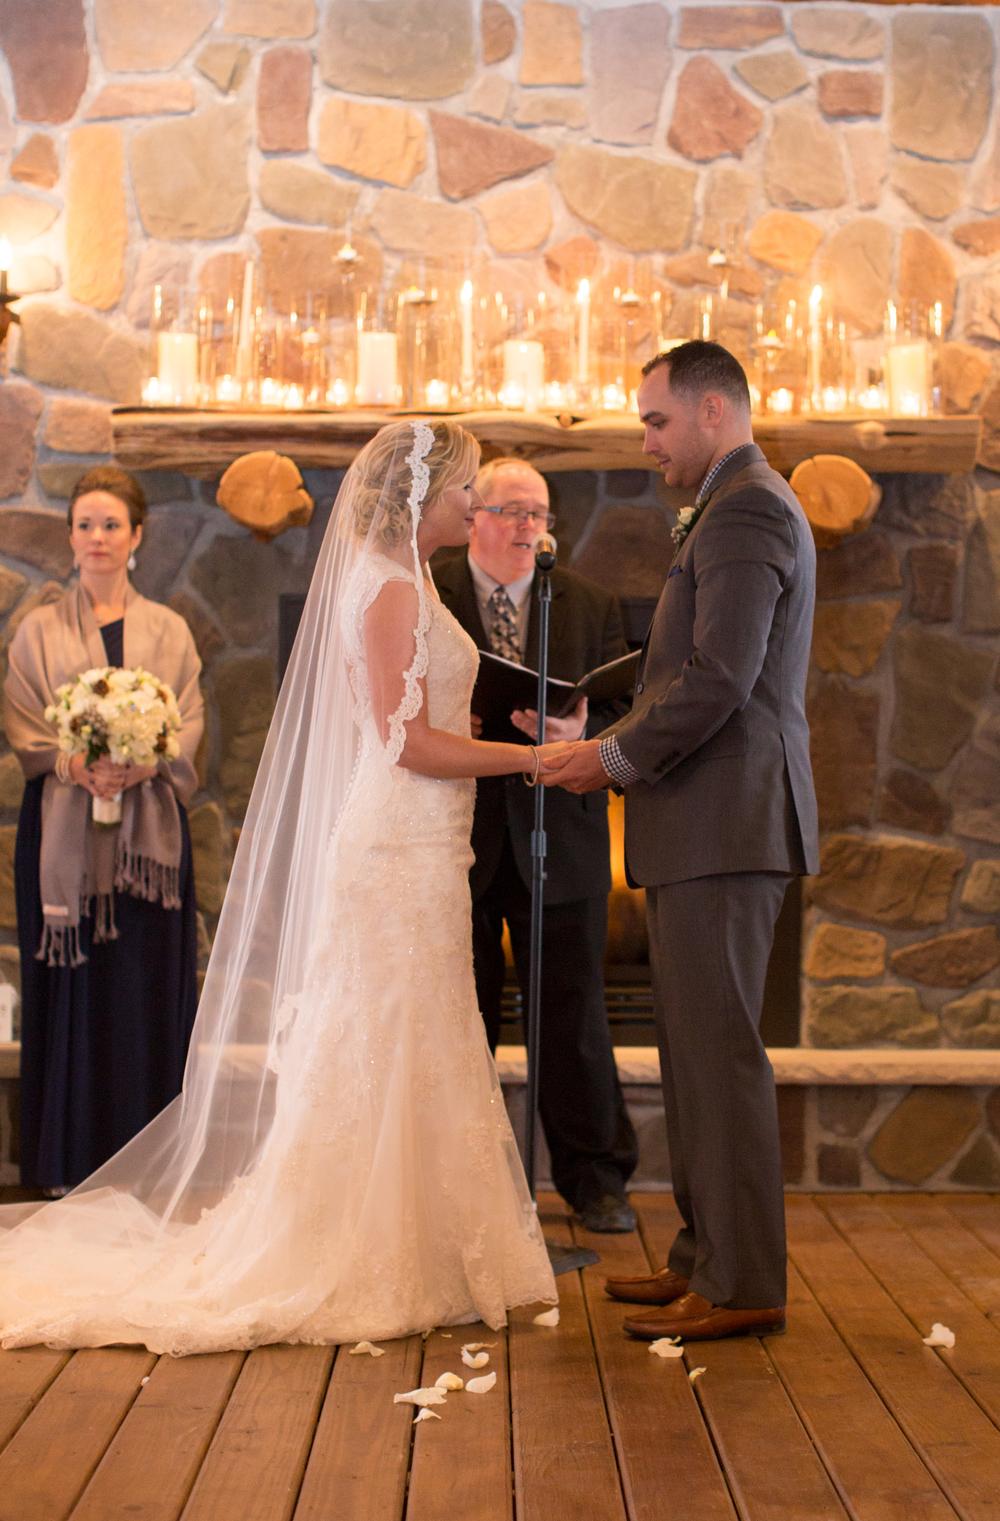 Ashley-reed-photography-pittsburgh-wedding-photographer-ashley-reed-pocconos-pa-mountain-top-wedding-93.jpg